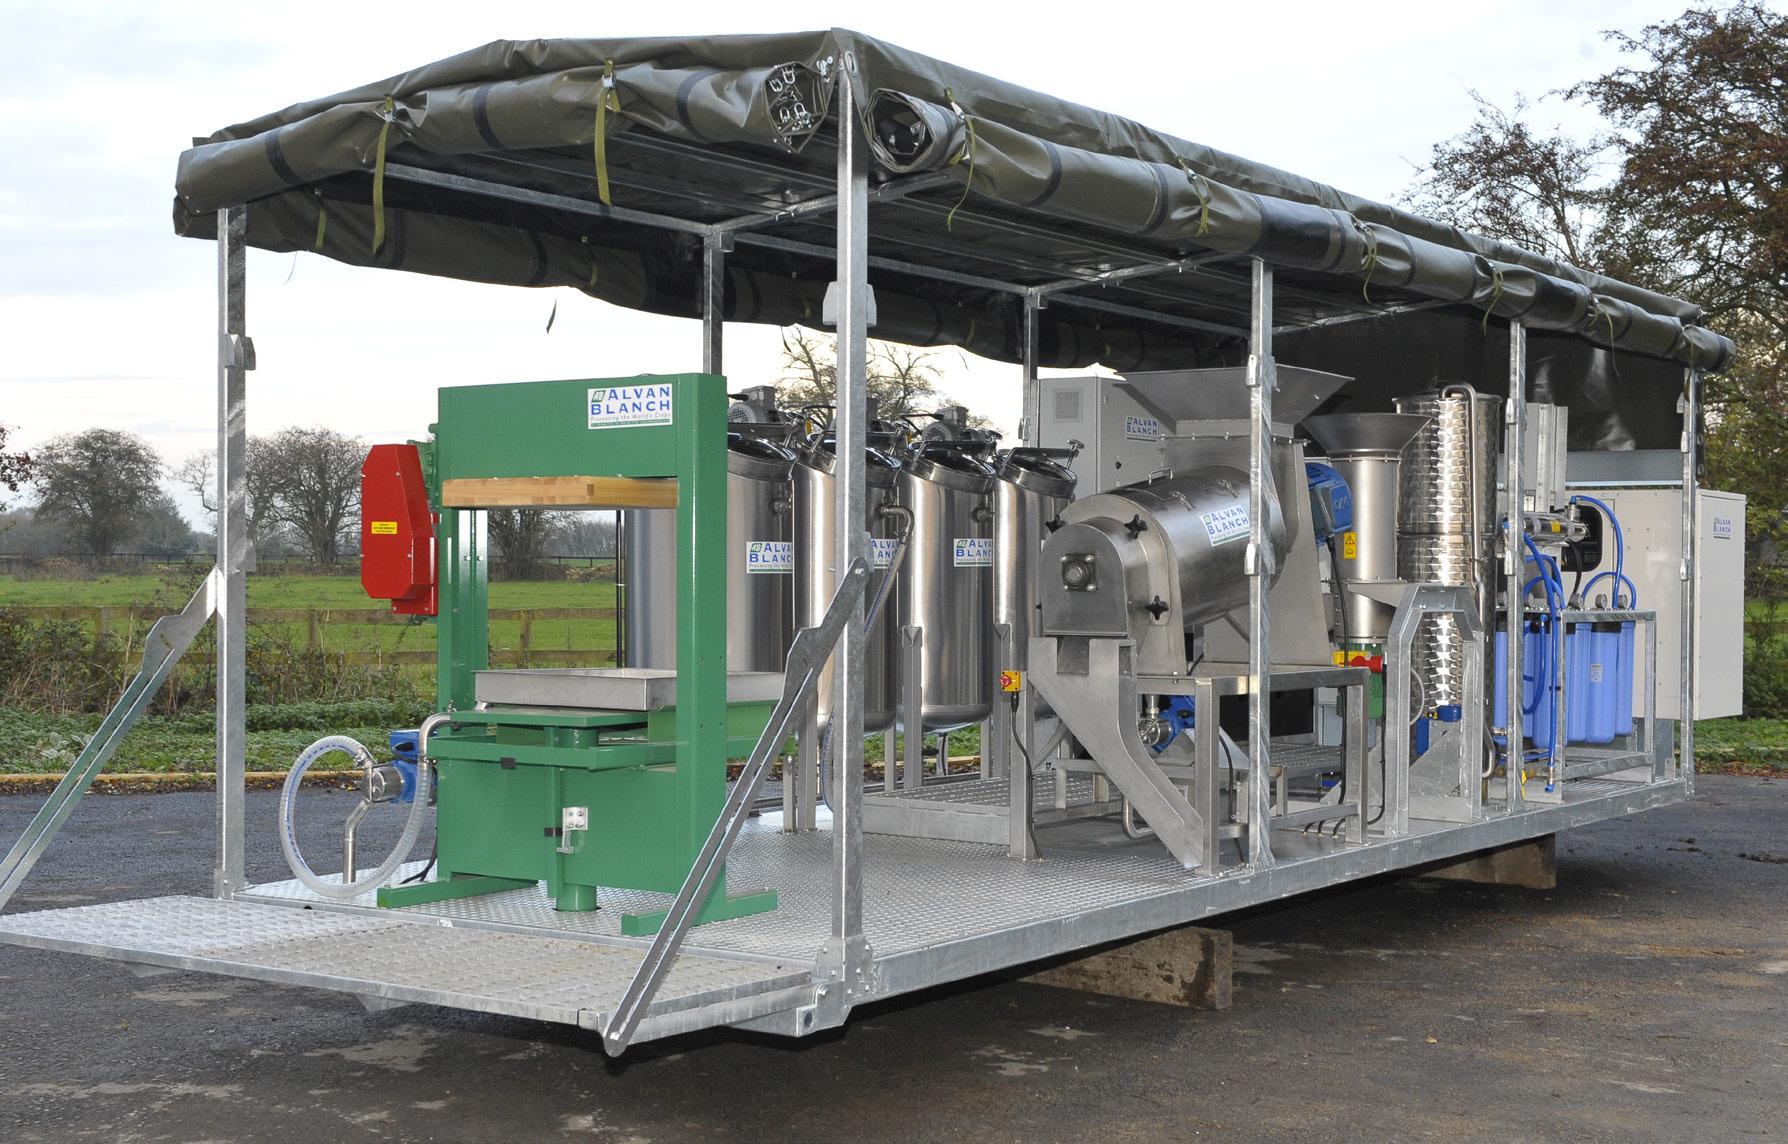 Alvan Blanch Mobile Fruit Juice Processing System Kampala Uganda Page 1 Image 0003